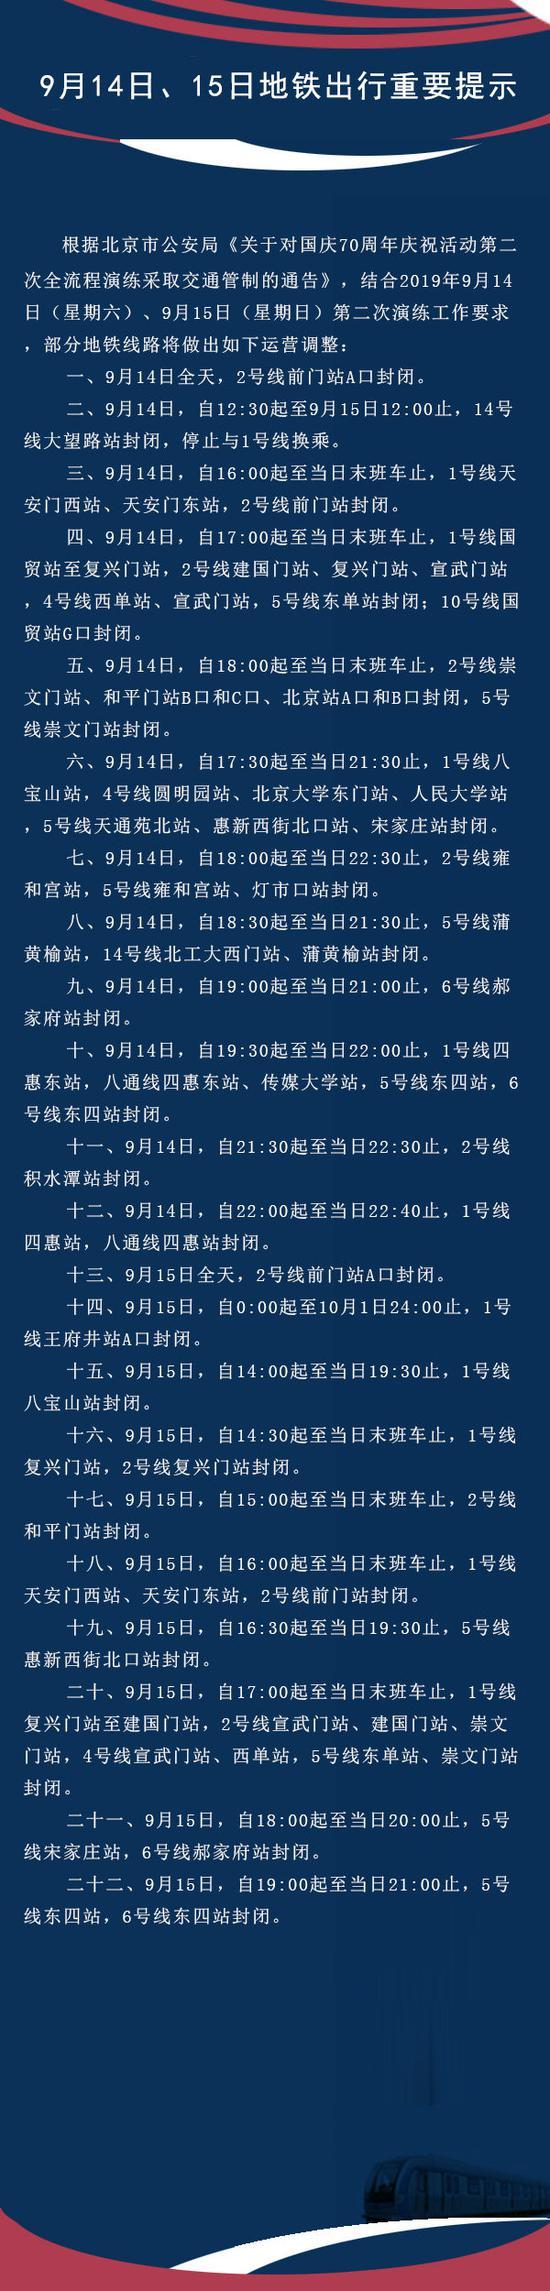 http://www.x5rc.com/zhengwu/981884.html